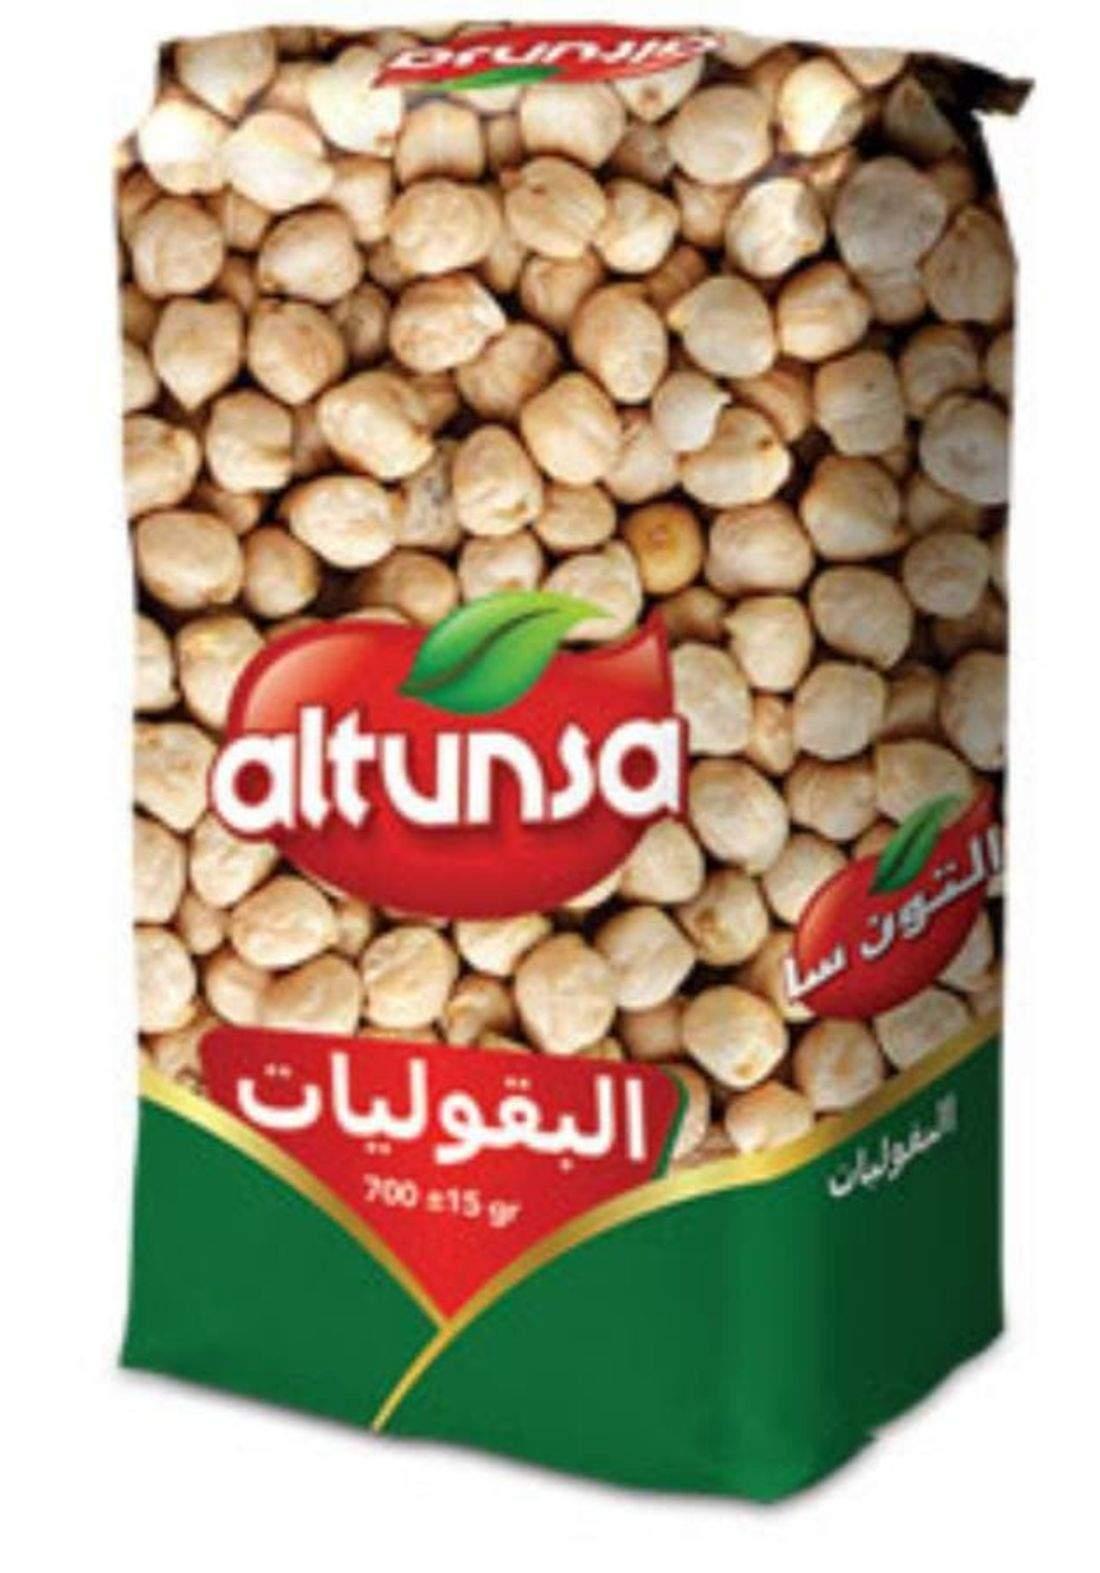 Altunsa 700g التون سا حمص